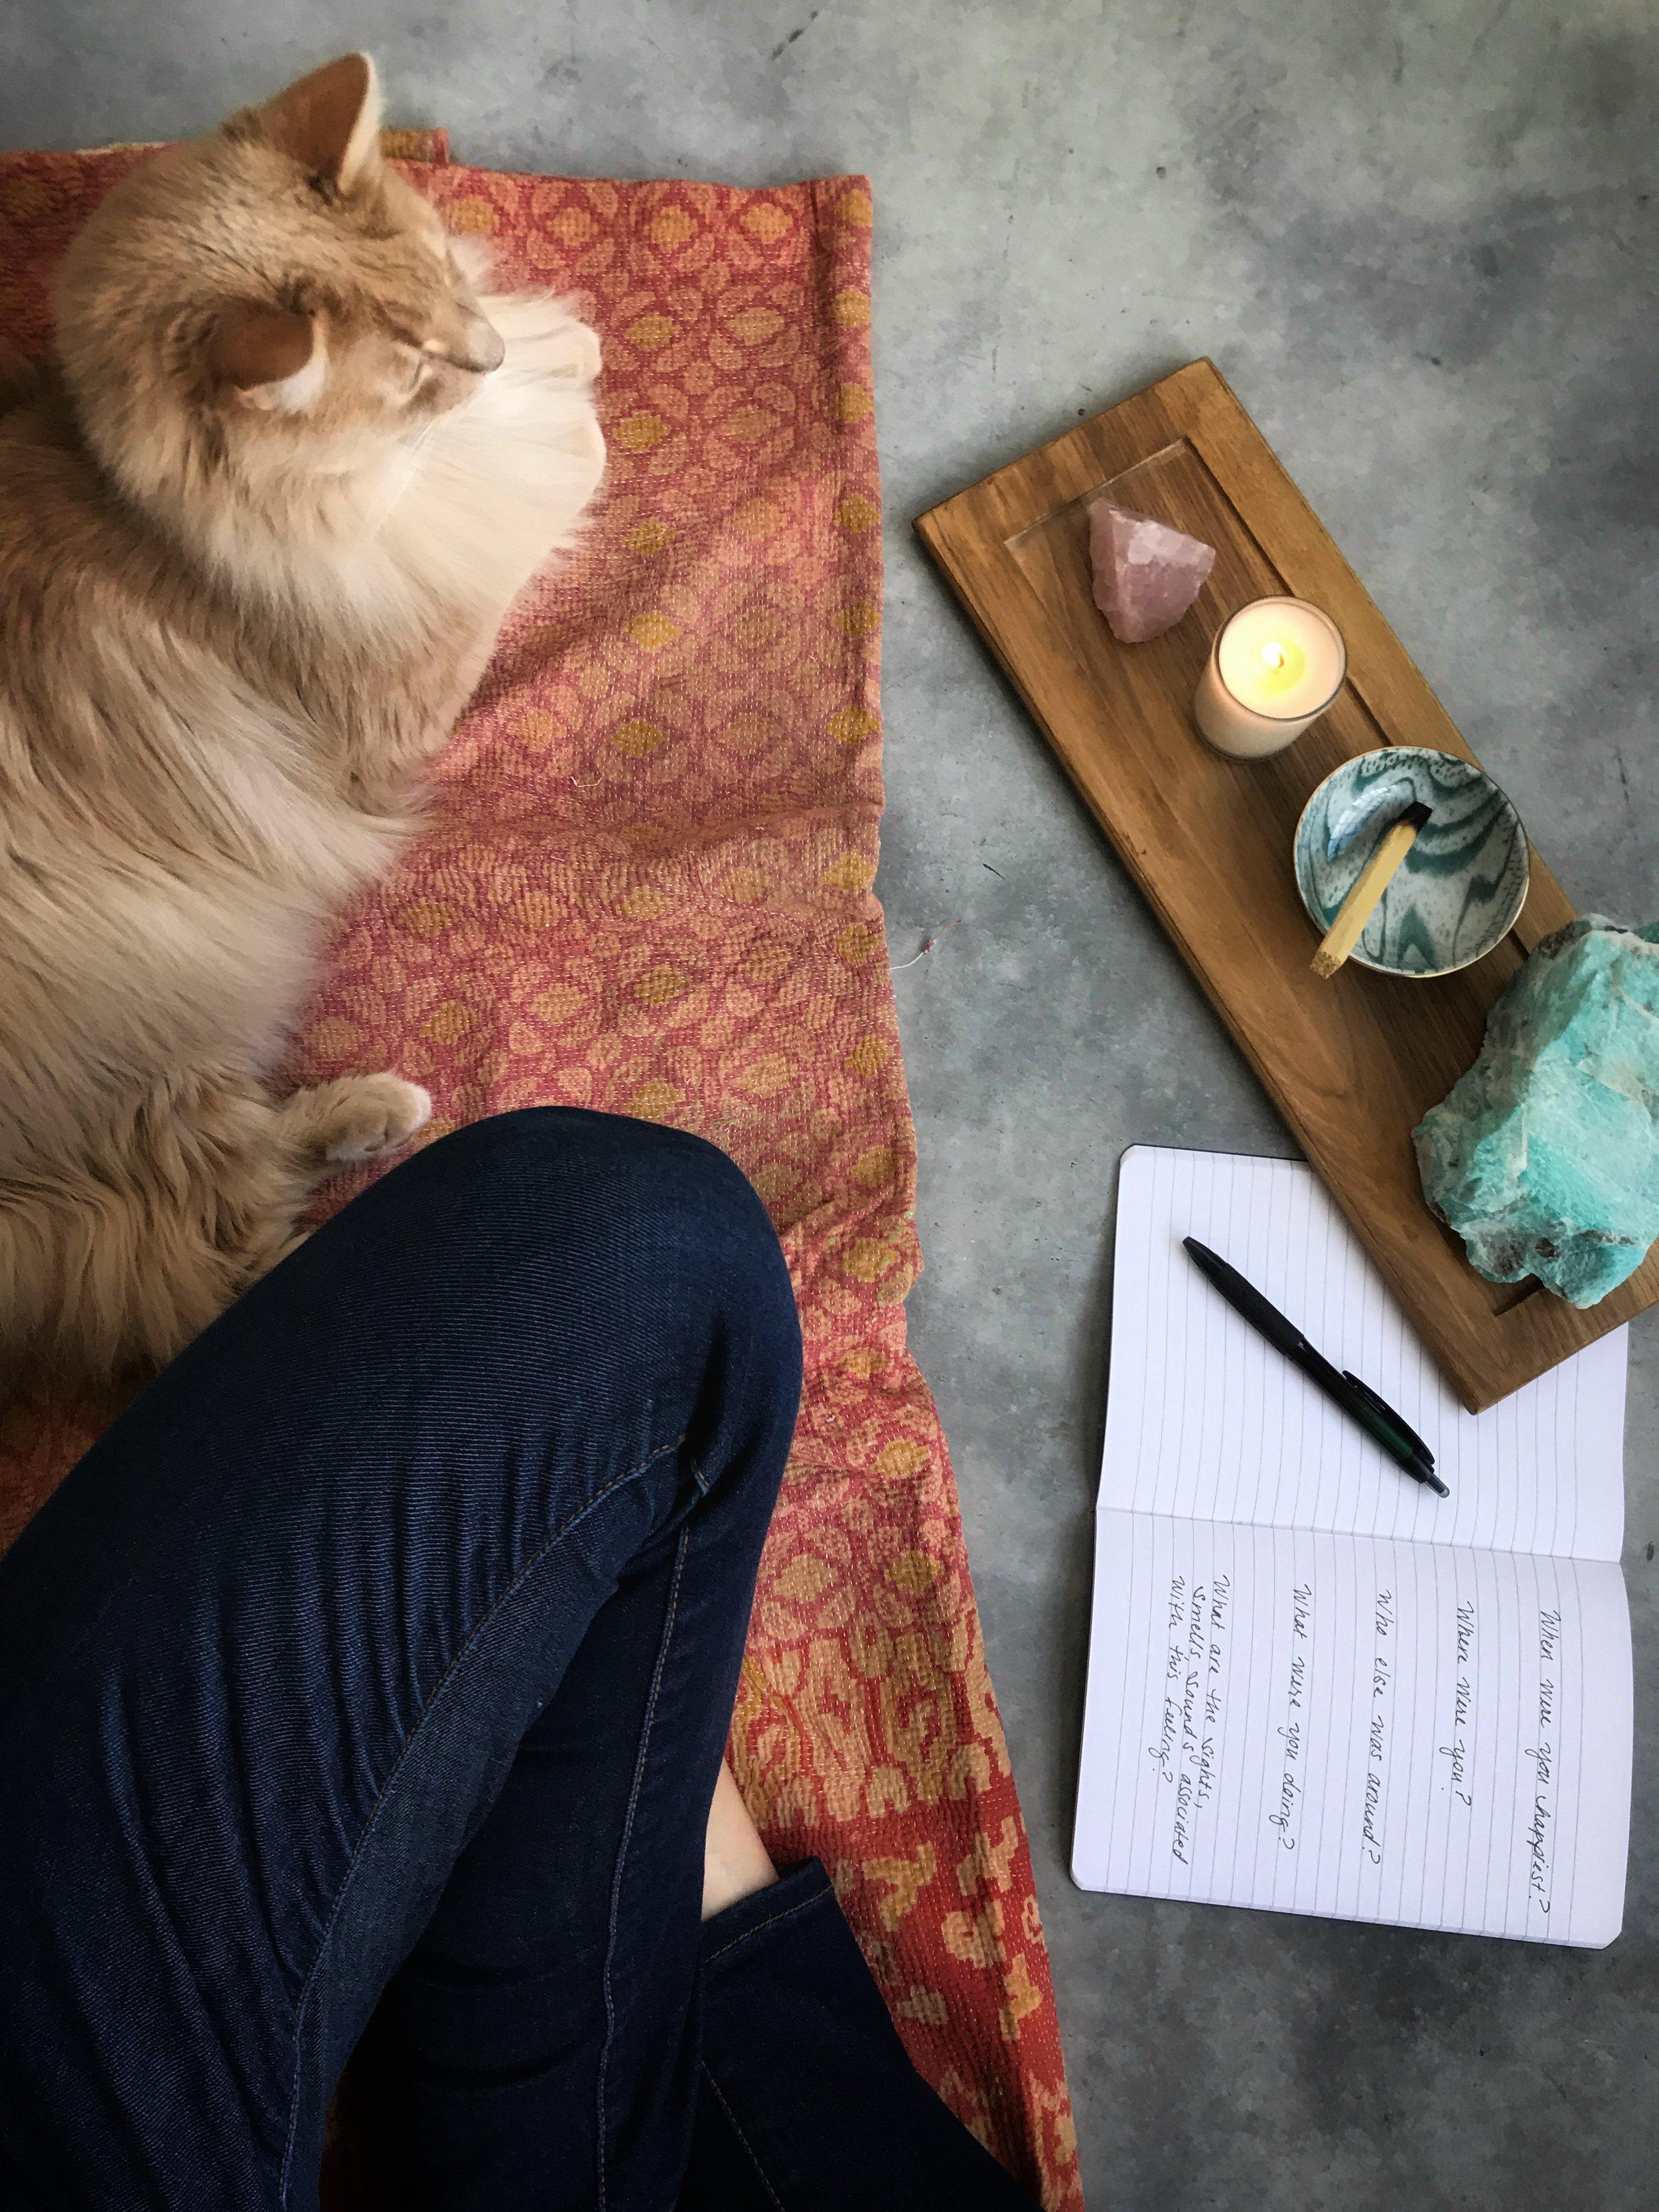 Rituals and self-care